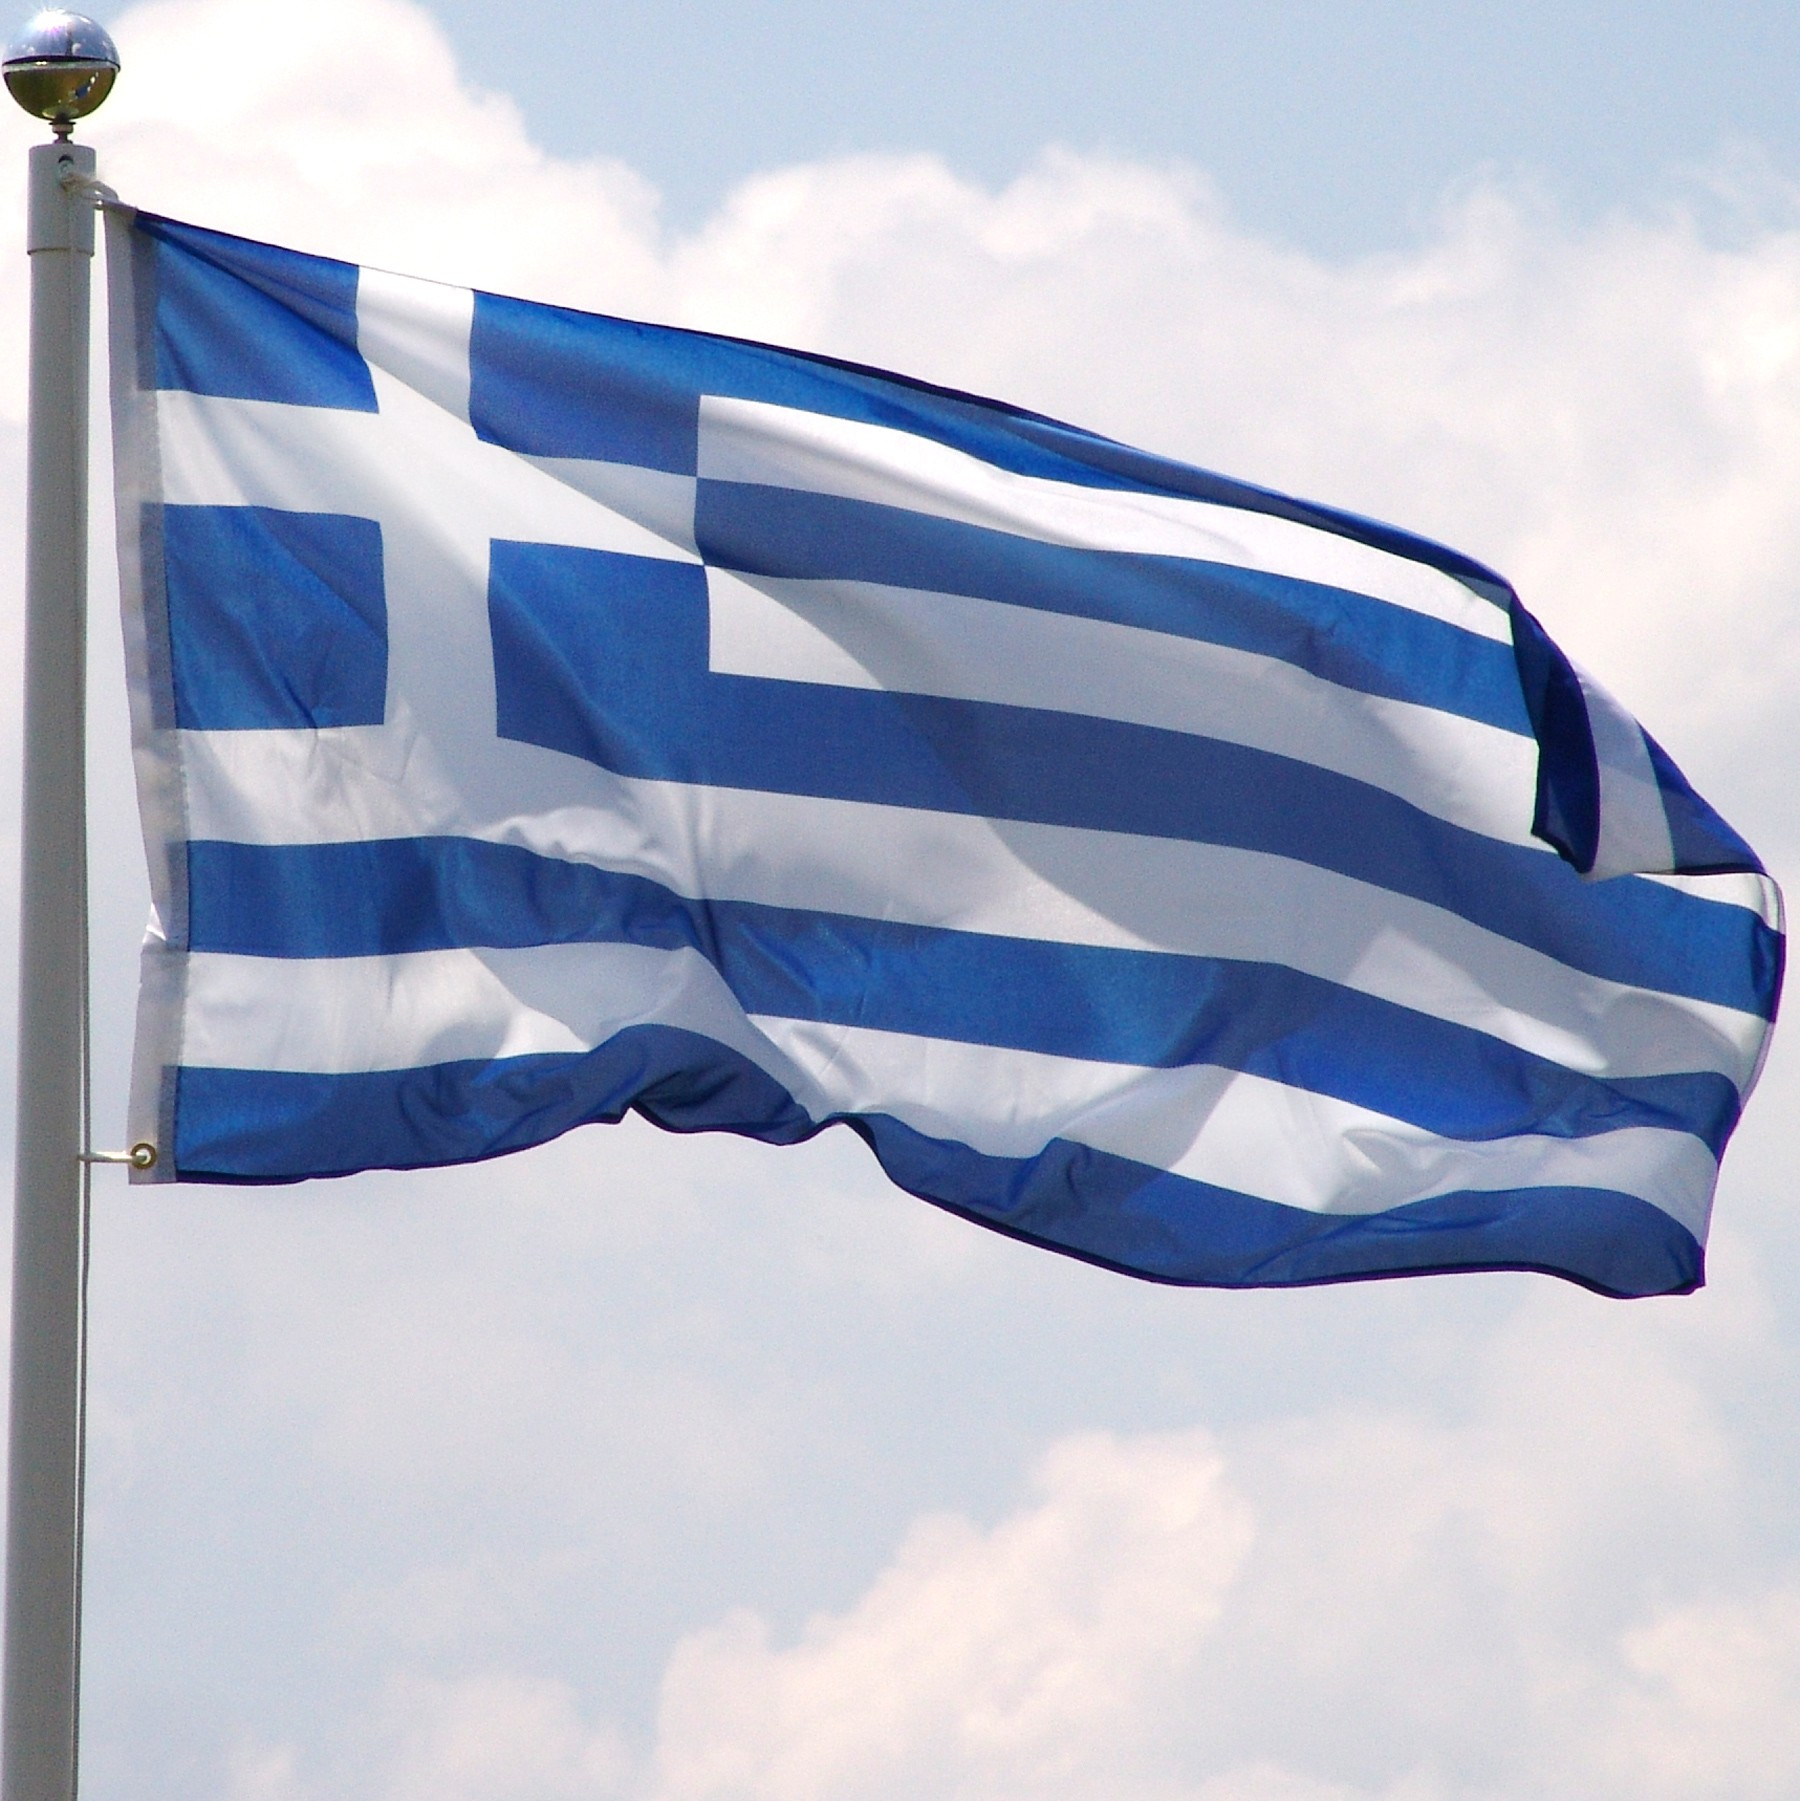 High Resolution Wallpaper | Flag Of Greece 1800x1801 px